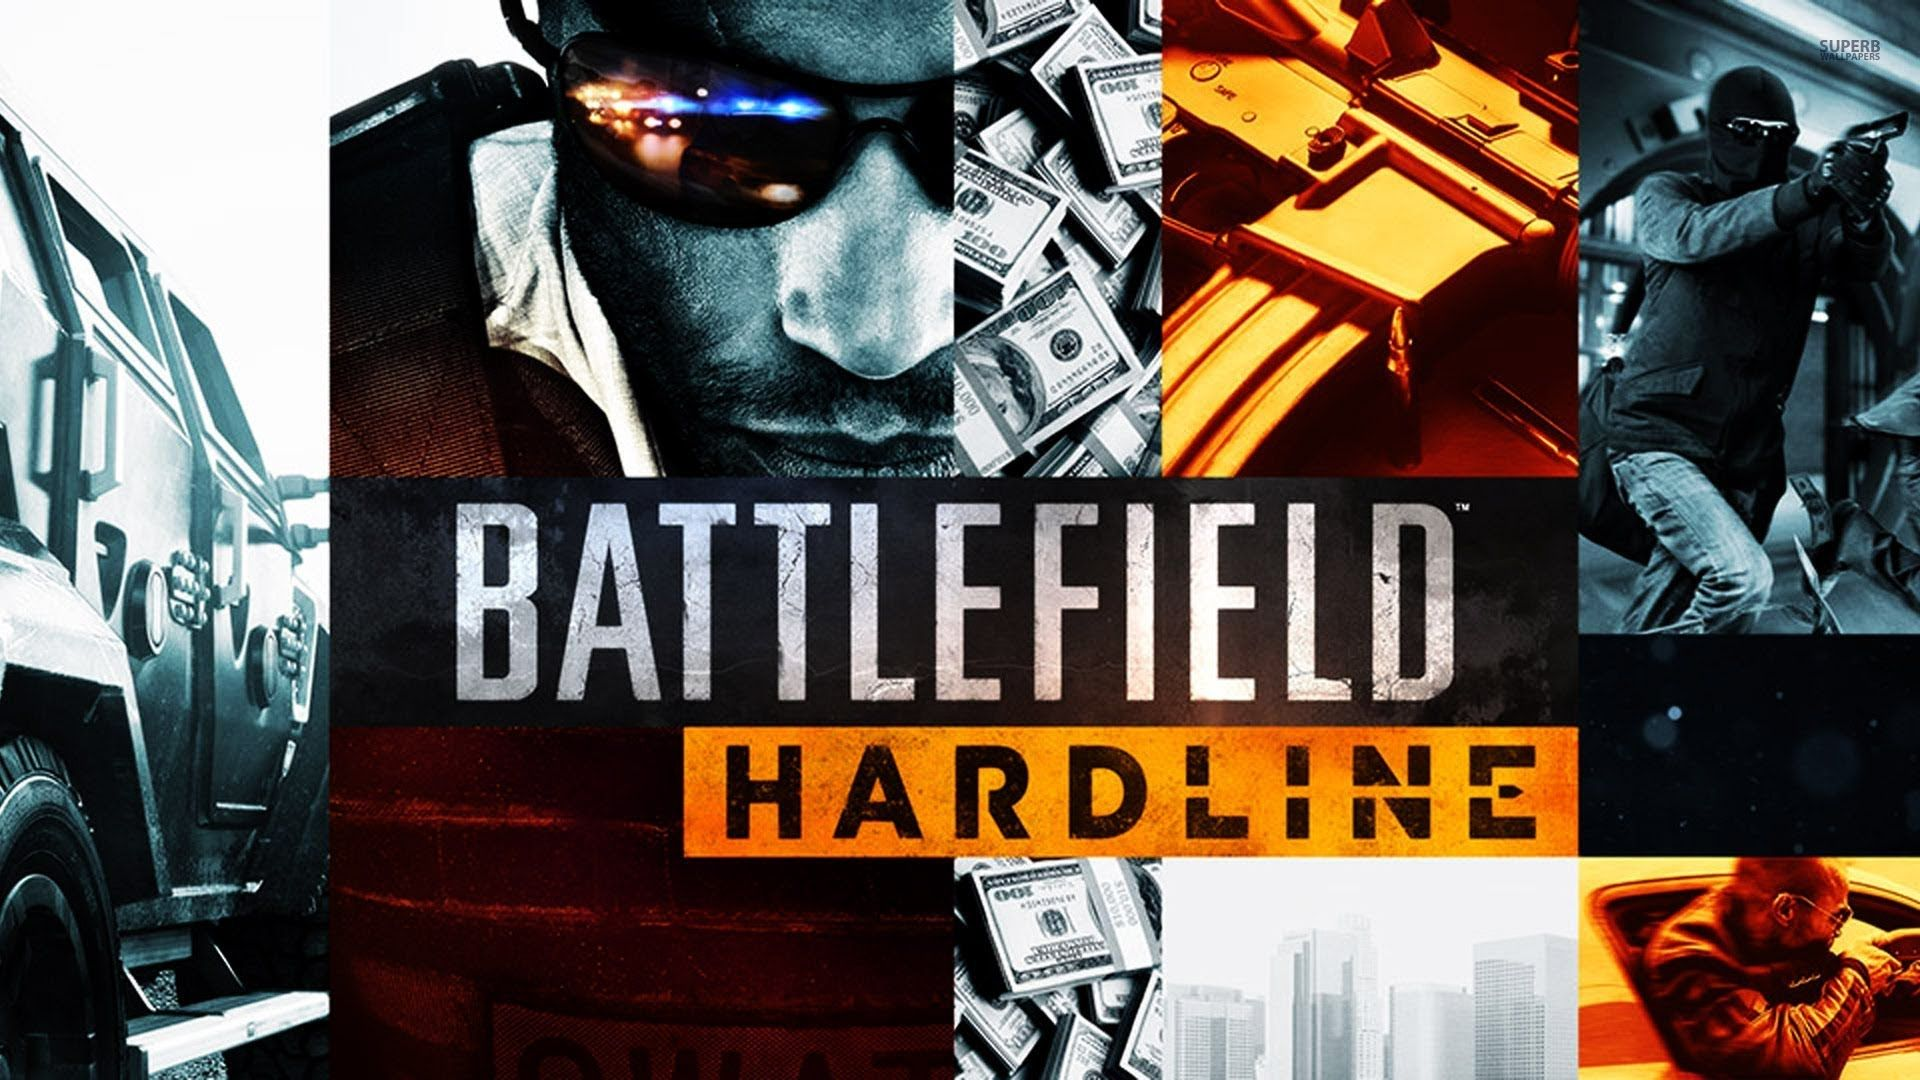 Battlefield Hardline Xbox One 1080 P Gamplay Part 01